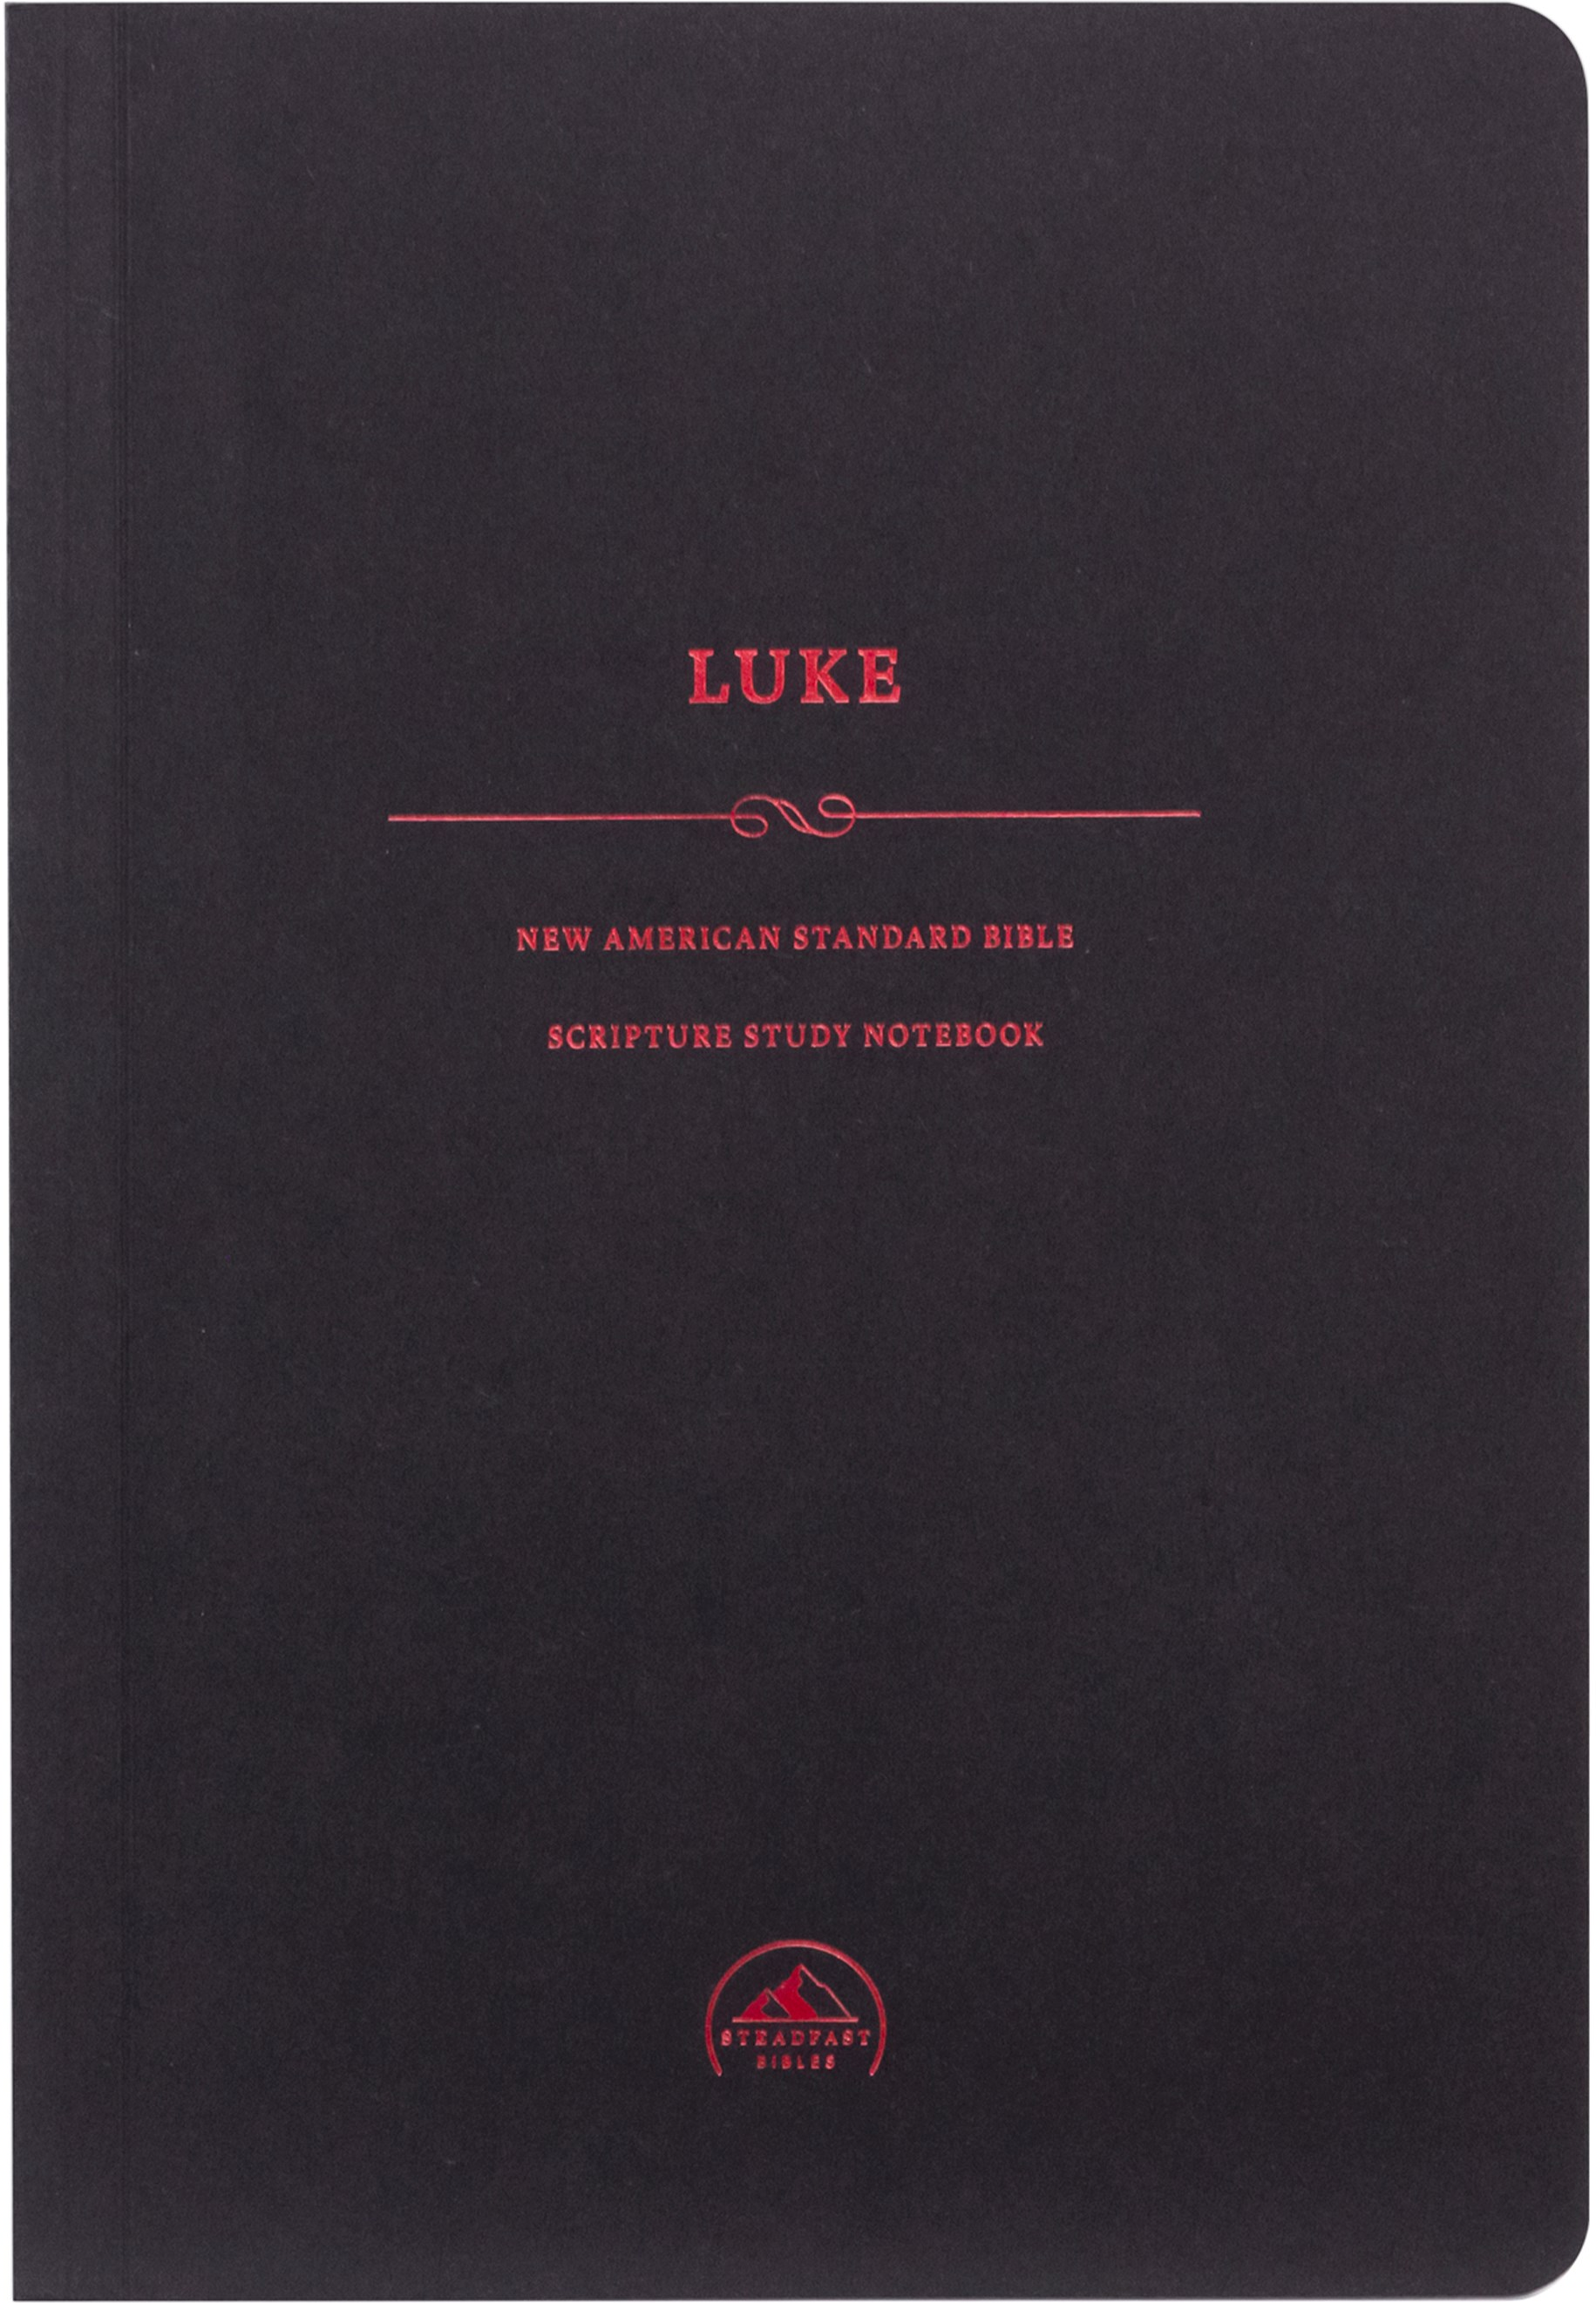 NASB Scripture Study Notebook: Luke